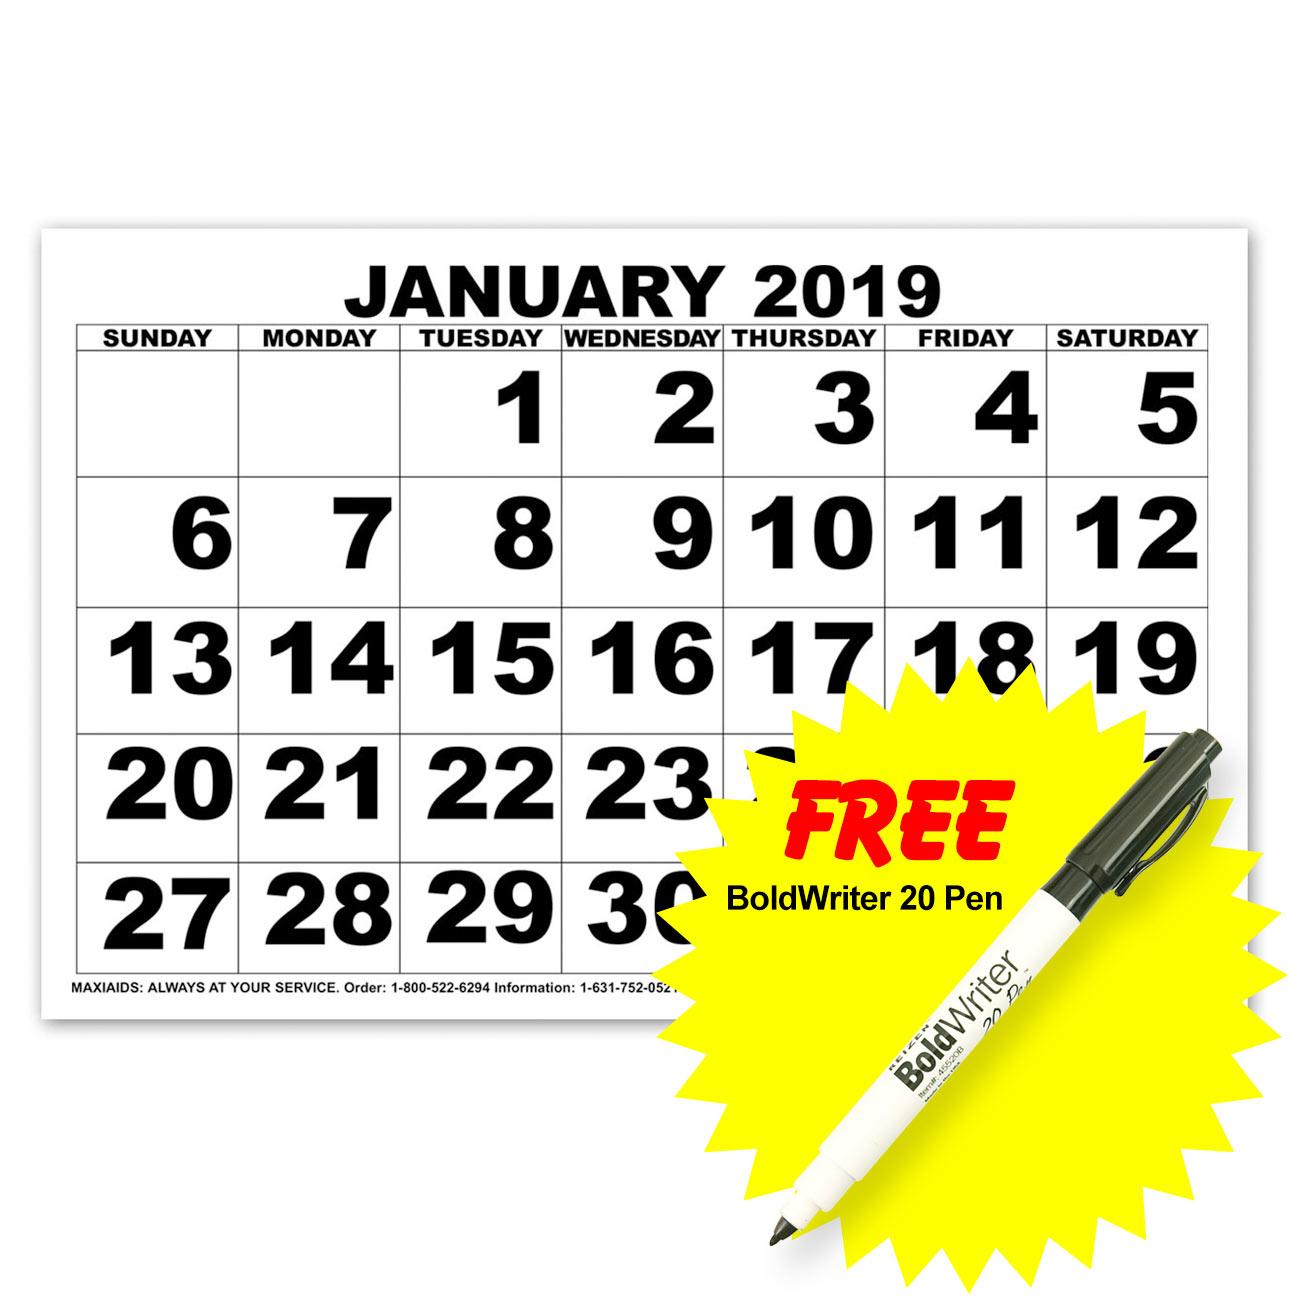 Low Vision Print Calendar - 2019 with BoldWriter 20 Pen